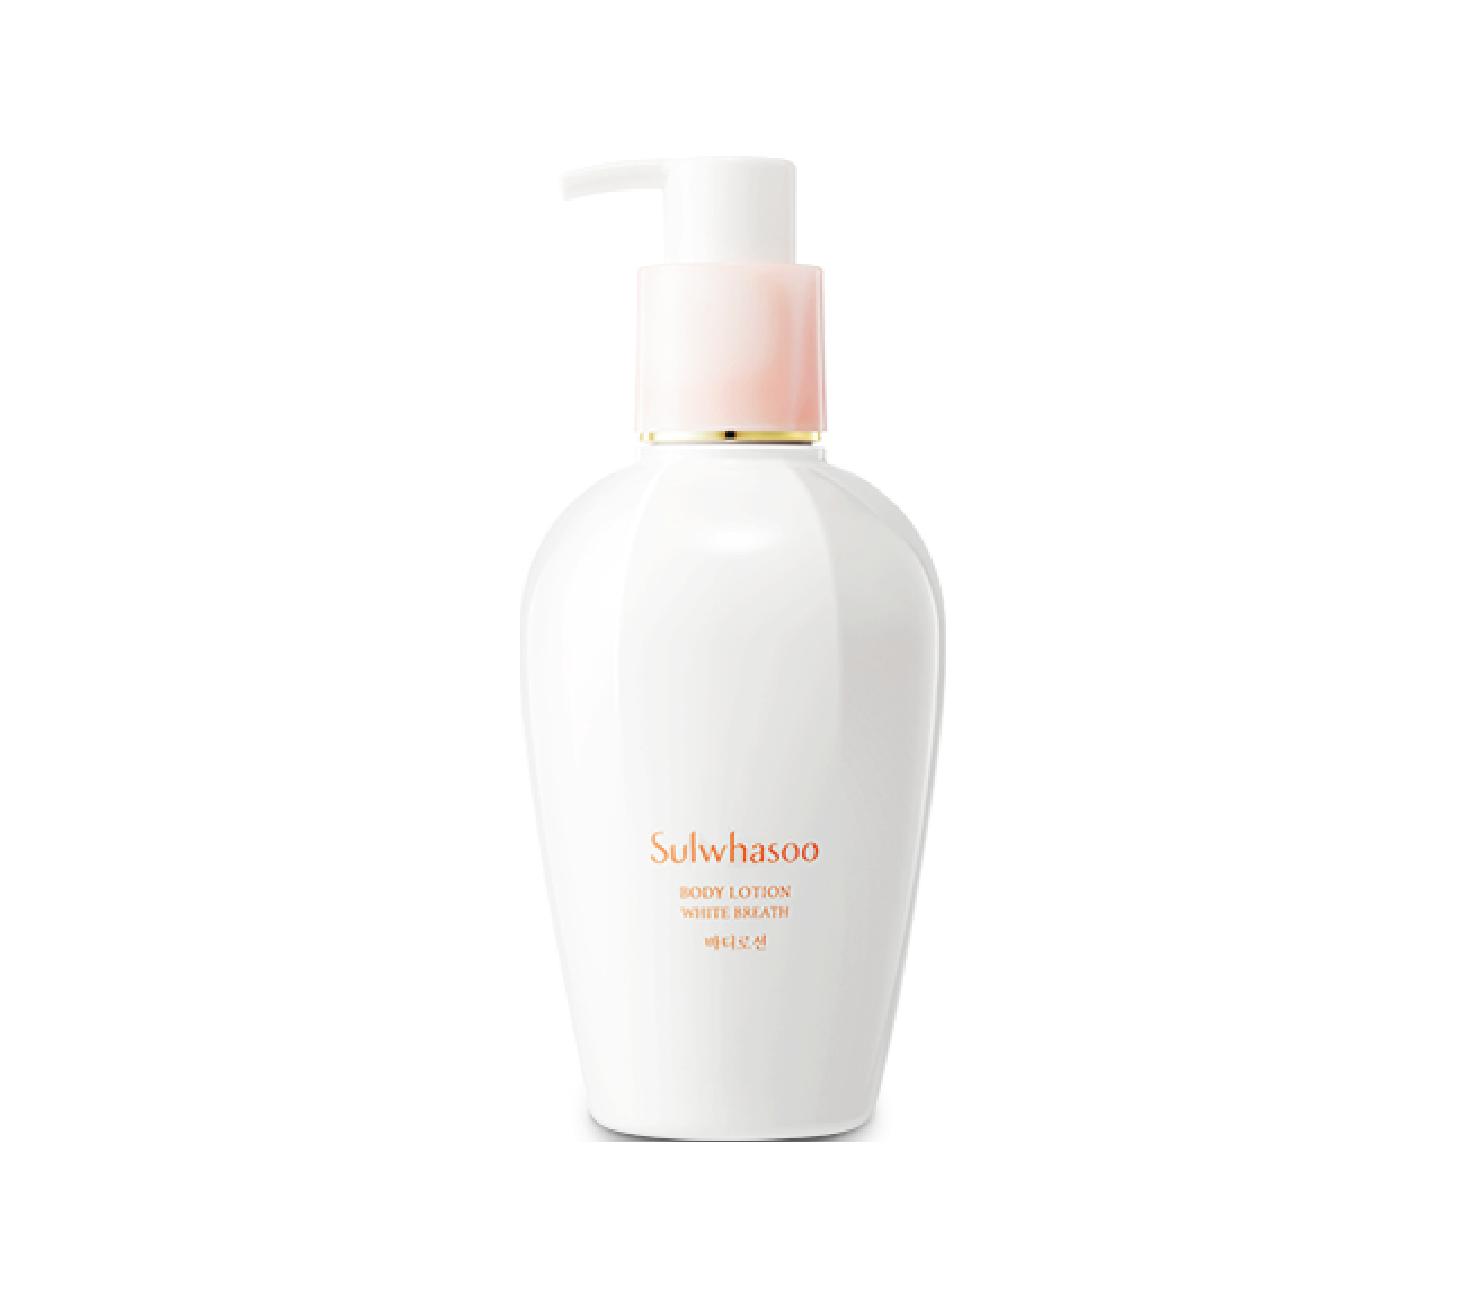 Sulwhasoo-body-lotion-white-breath